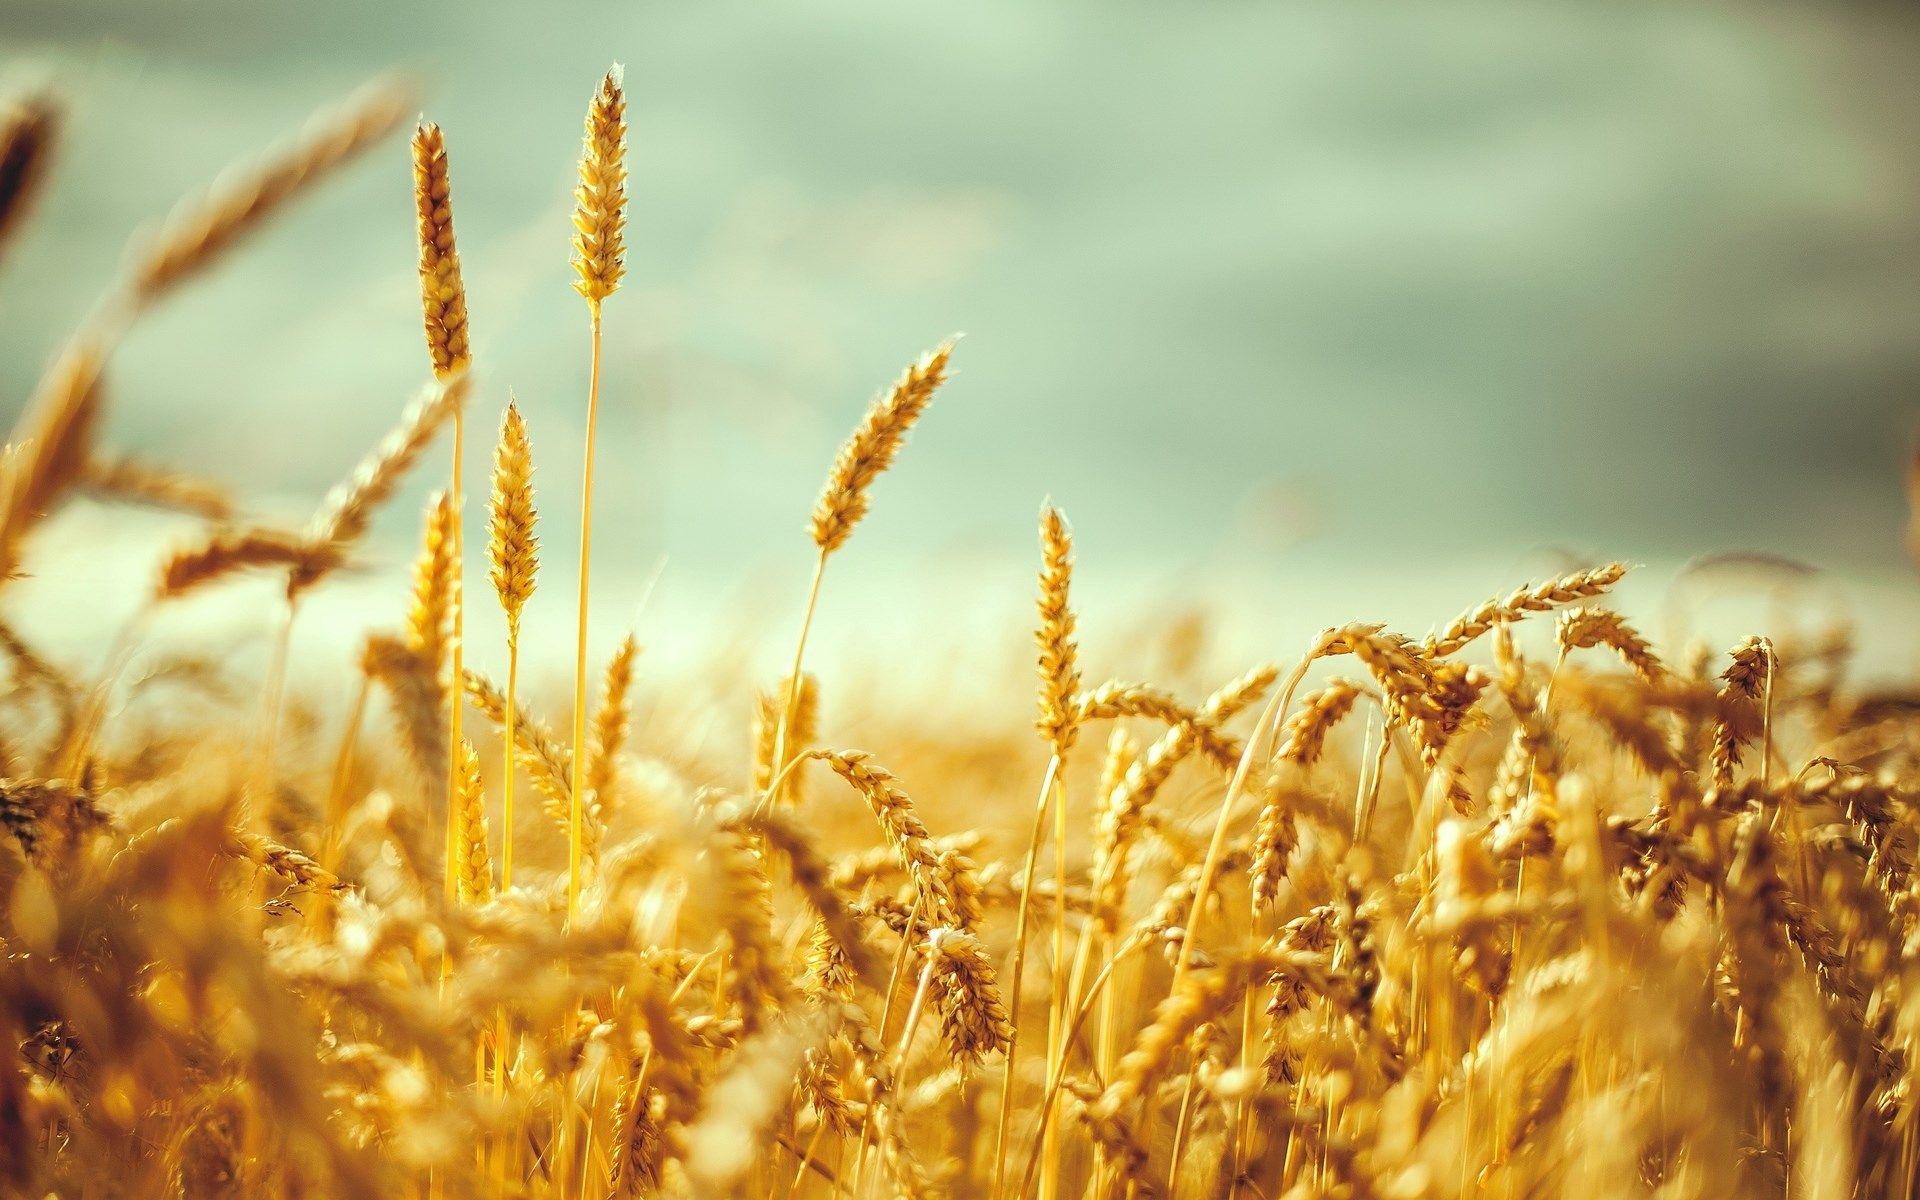 Wheat Wave Analysis – 30 December, 2019